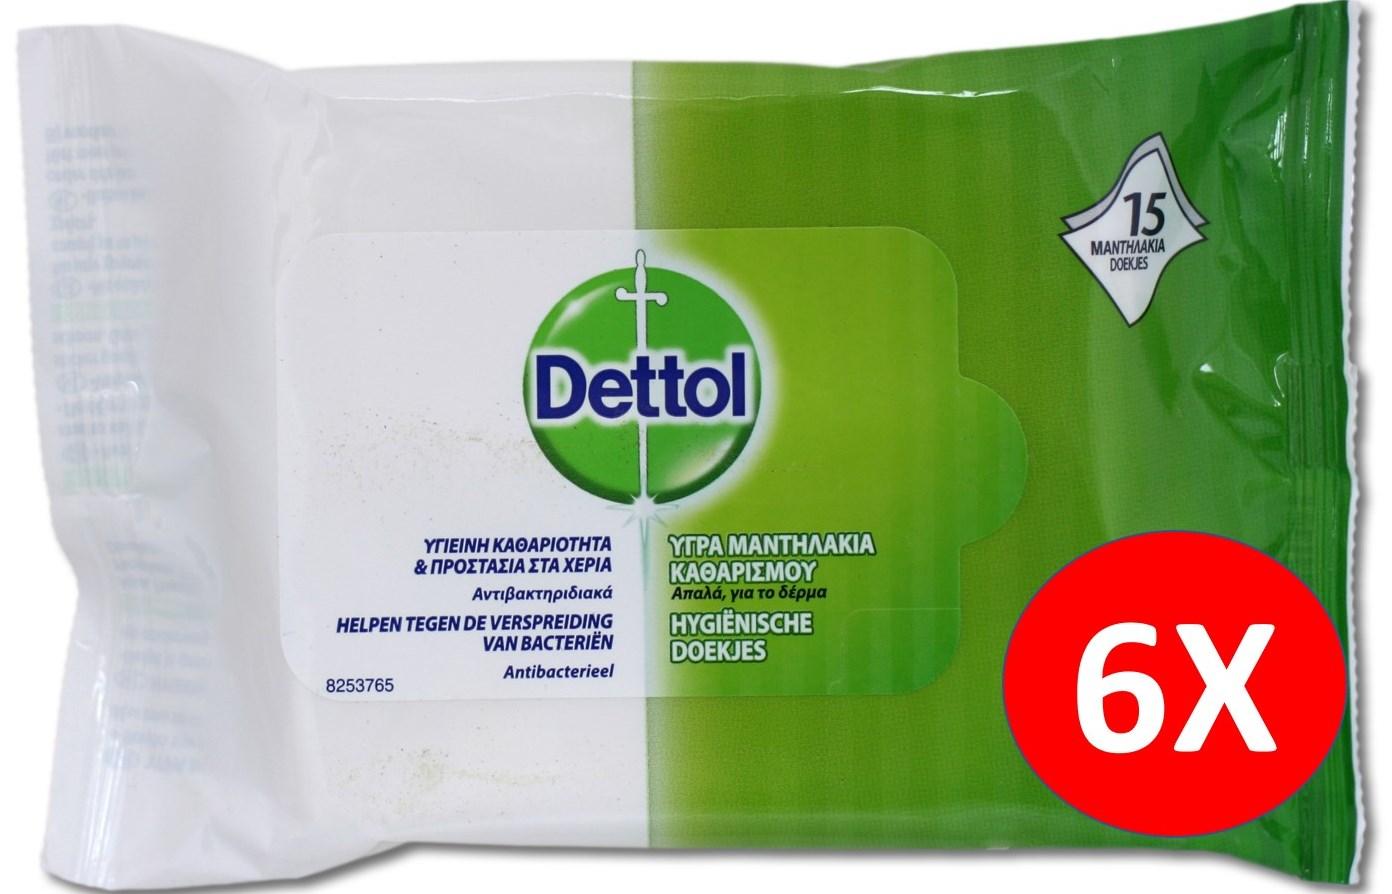 DETTOL Υγρά Μαντηλάκια Προσωπικής Υγιεινής: 6,9€ Από 18€ Για 6 Συσκευασίες Που Εξουδετερώνουν Το 99,9% Των Μικροβίων Ανά Πάσα Στιγμή, Οπουδήποτε! H Καλύτερη Τιμή Της Αγοράς!